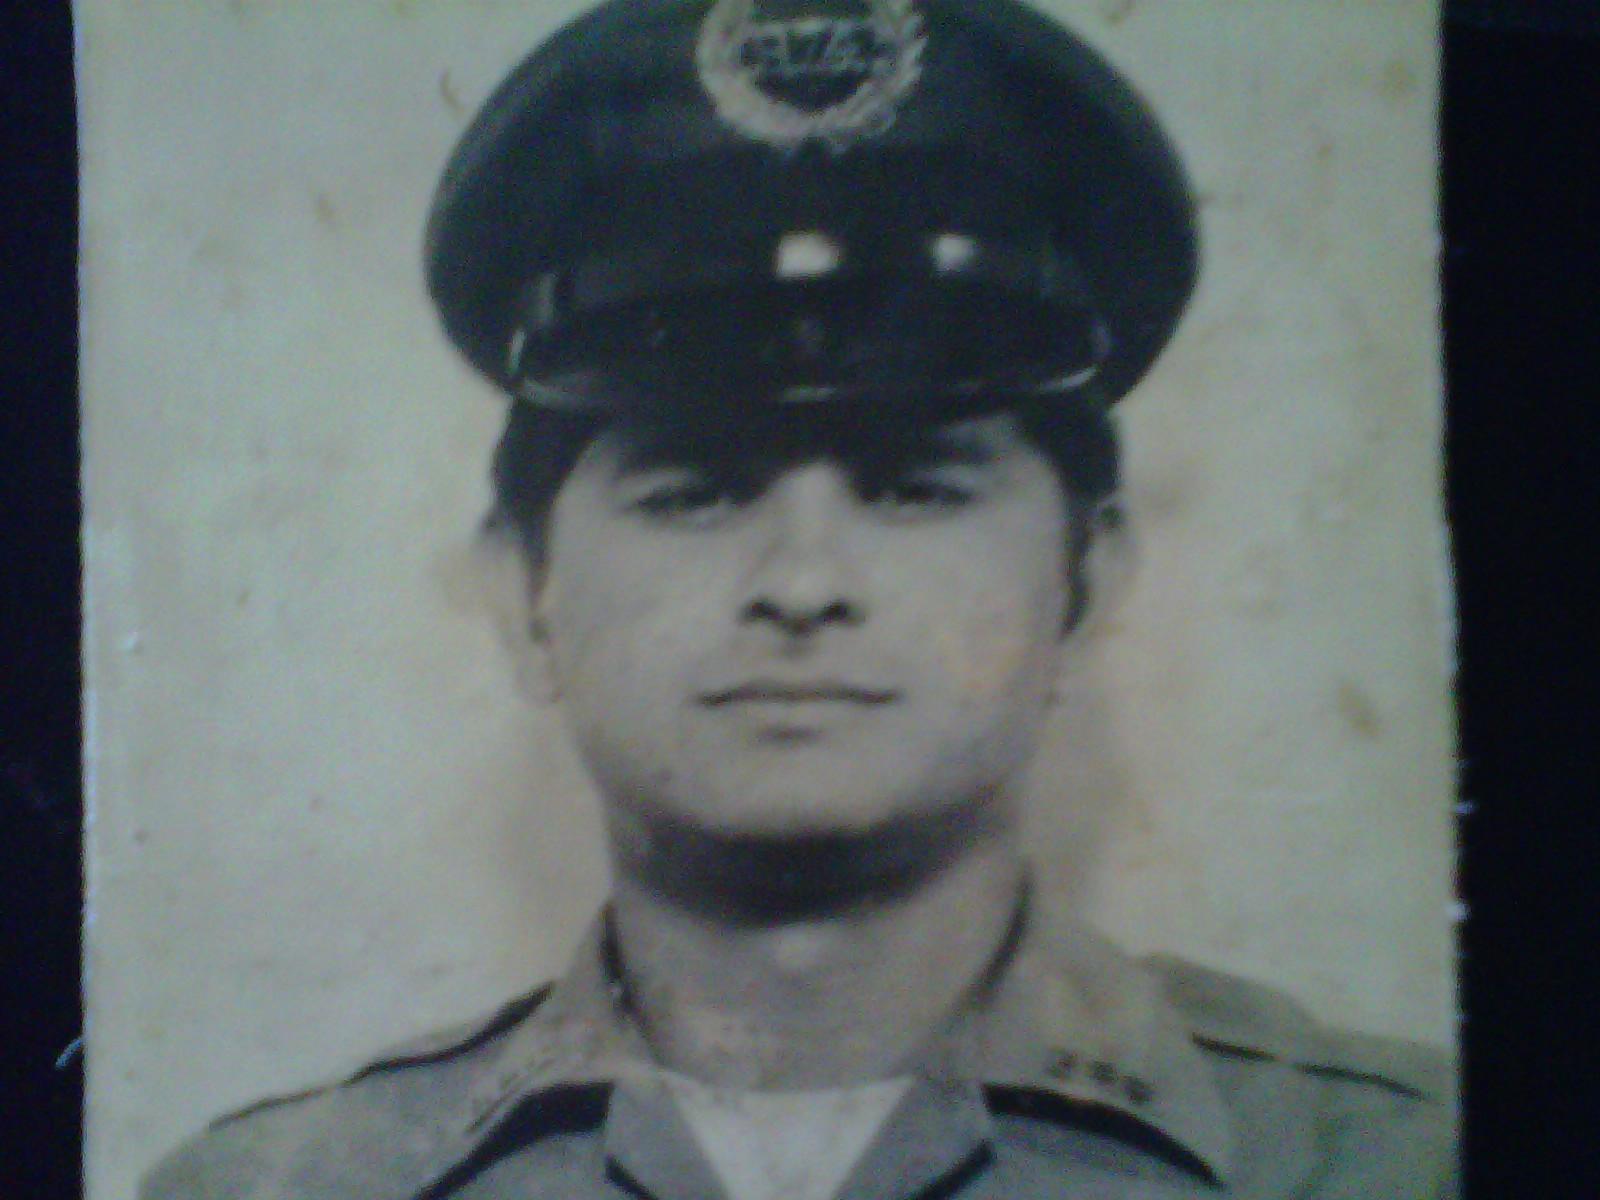 Policeman Celestino Solivan-Almedina | Puerto Rico Police Department, Puerto Rico